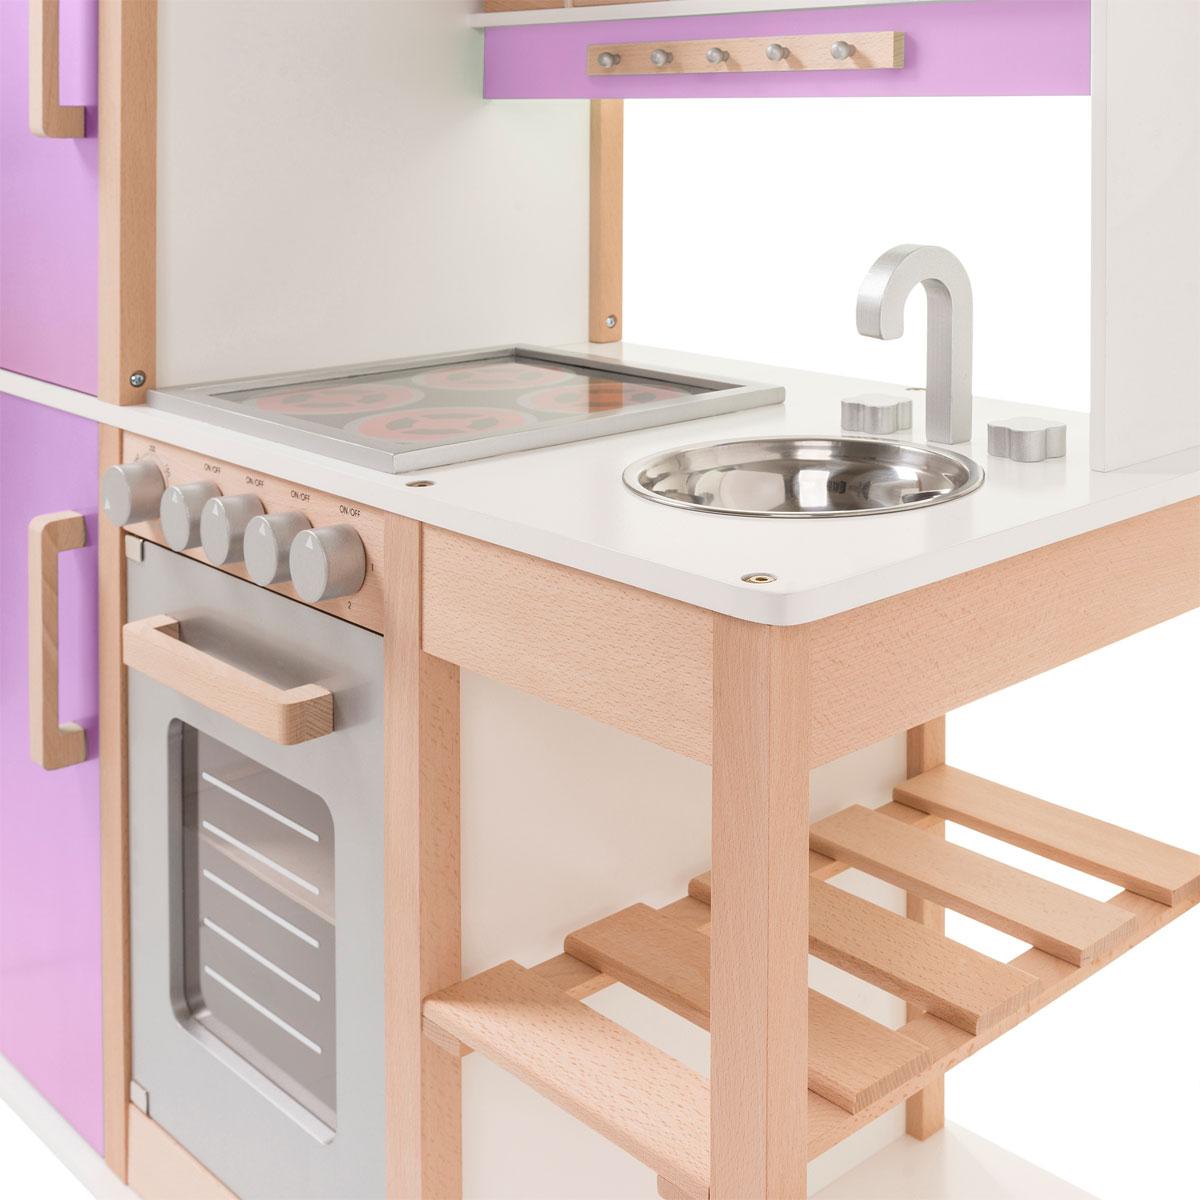 sun 04137 cuisine jouer pirum. Black Bedroom Furniture Sets. Home Design Ideas